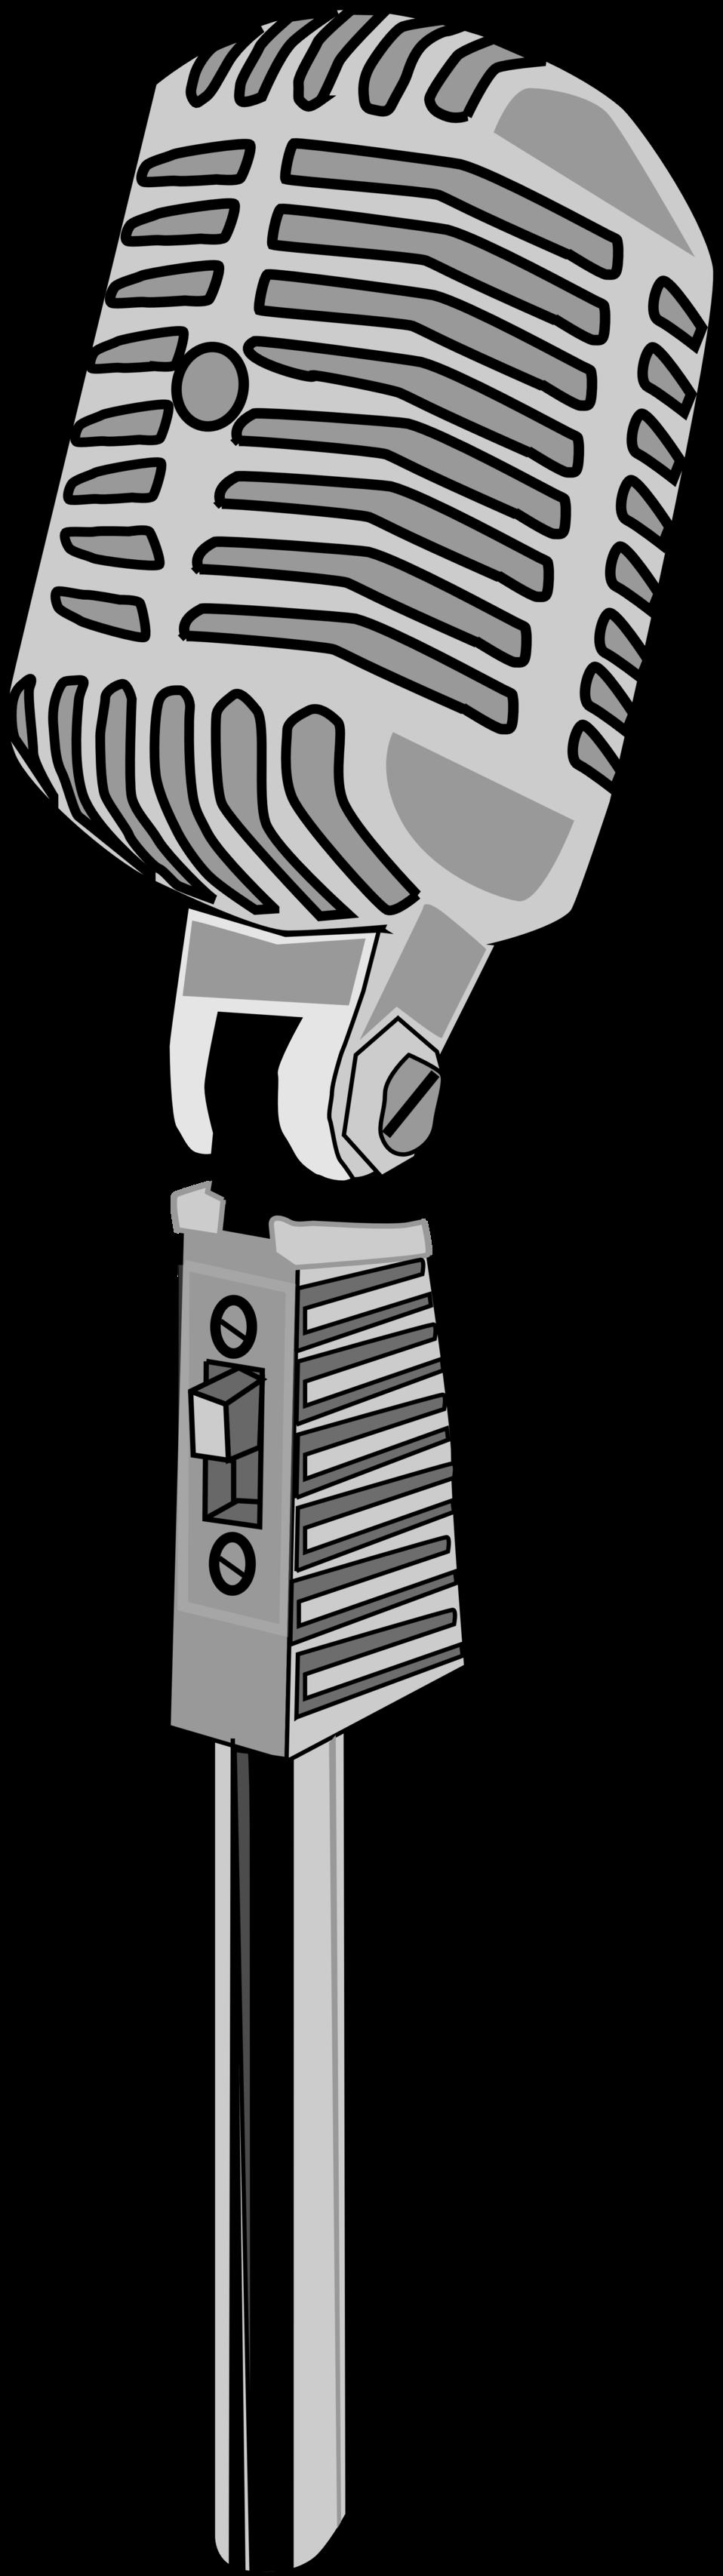 clipart stock Karaoke microphone clipart. Public domain clip art.